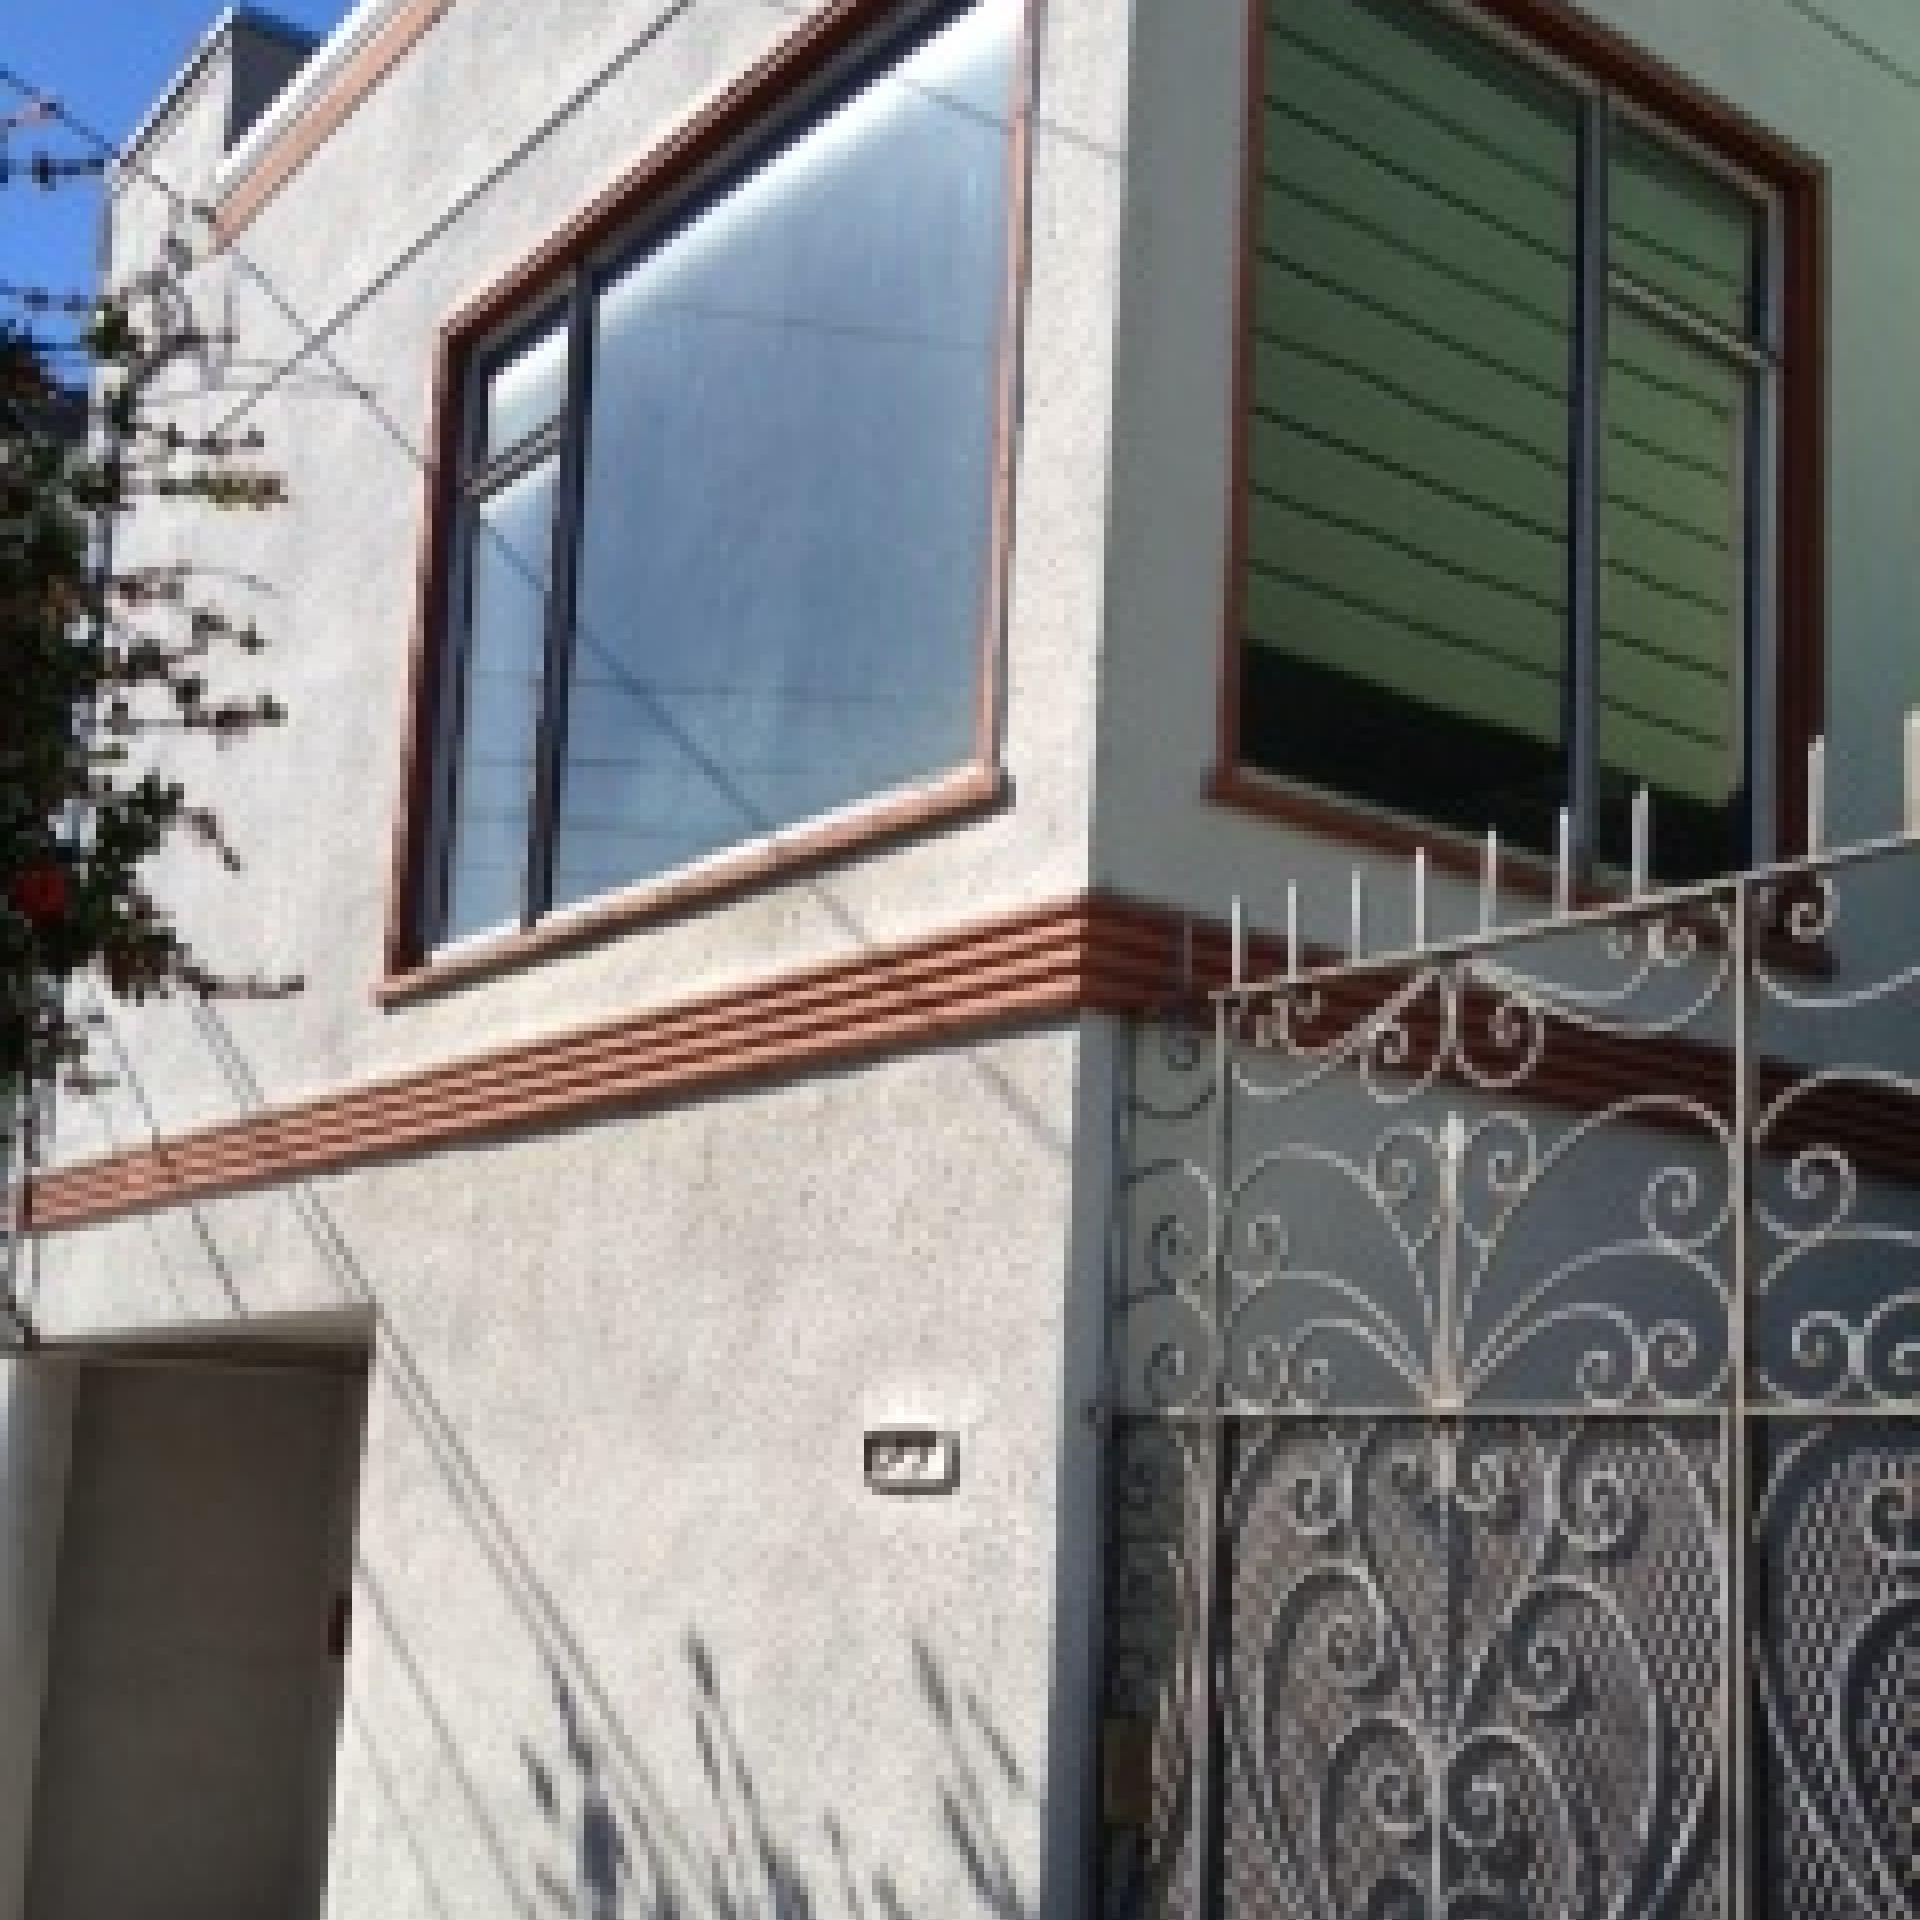 4BR/2BA house in Oceanview